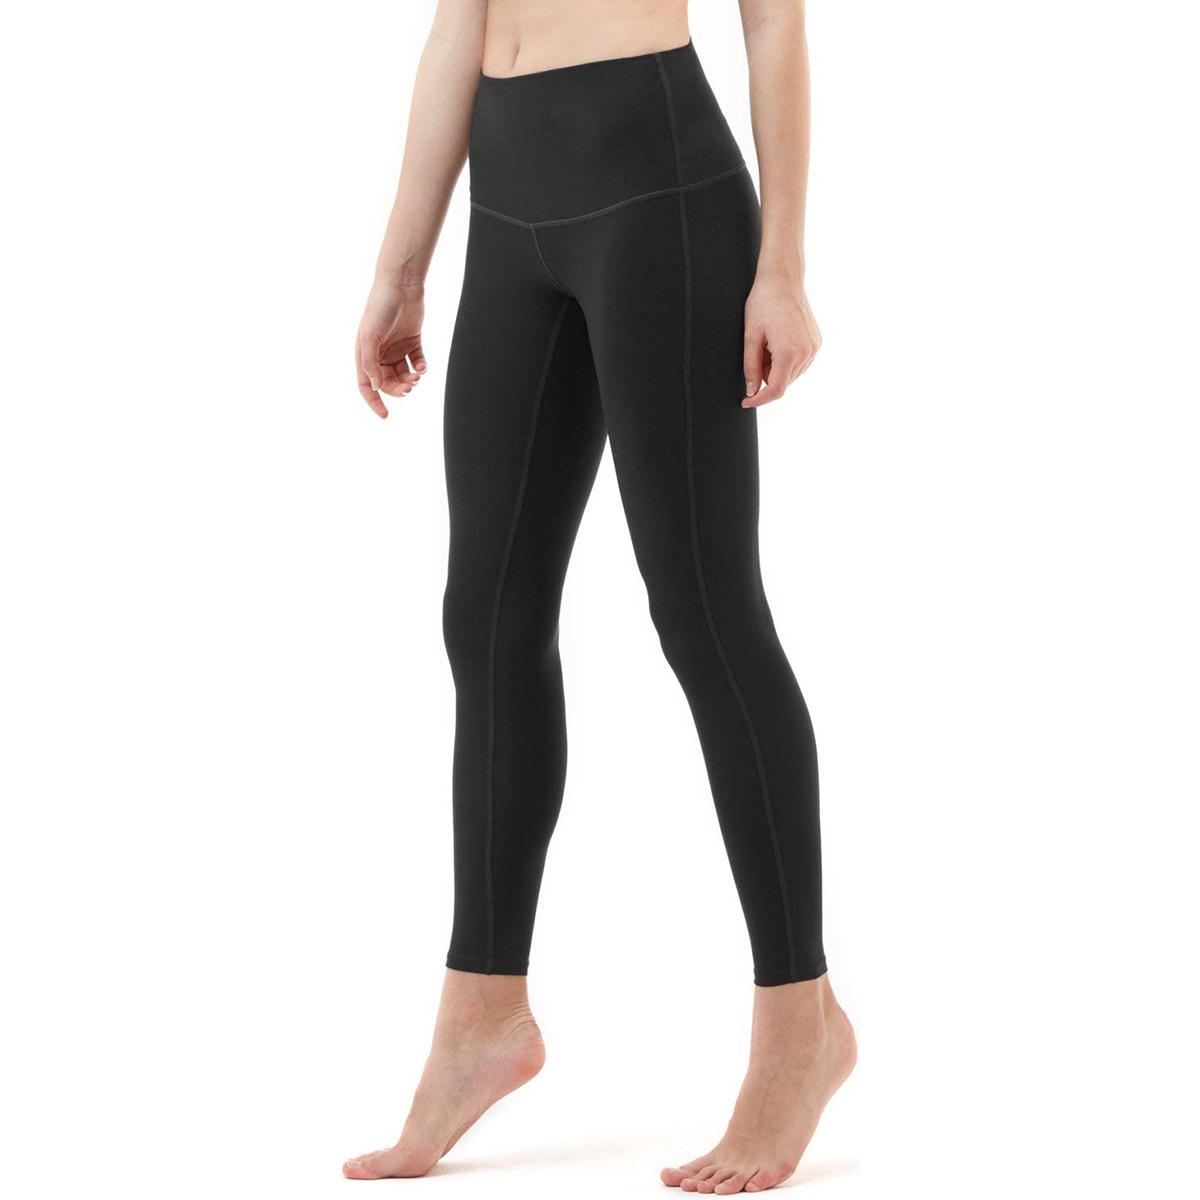 thumbnail 19 - TSLA Tesla FYP52 Women's High-Waisted Ultra-Stretch Tummy Control Yoga Pants